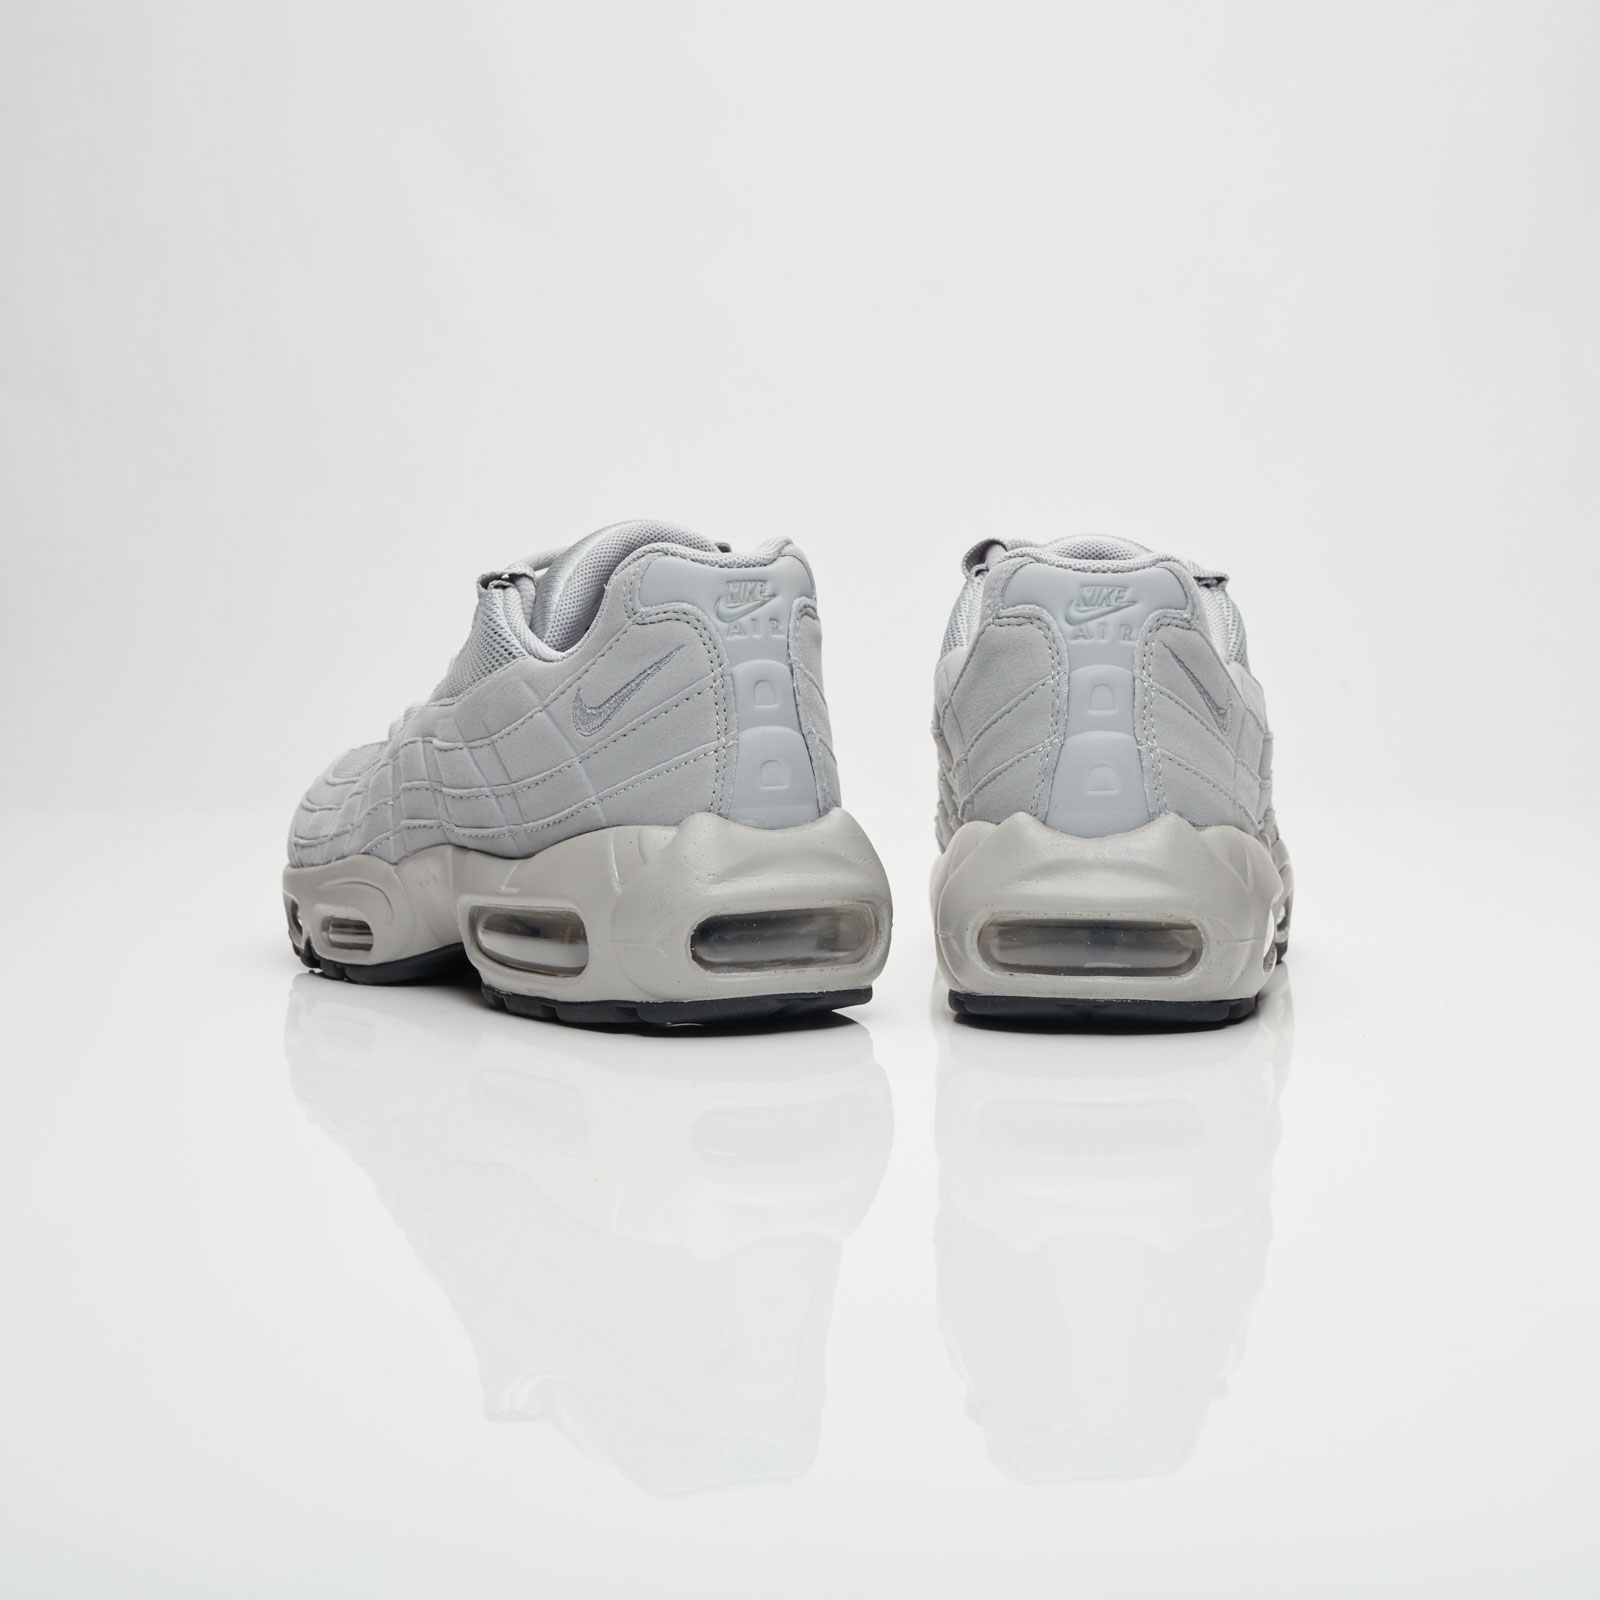 Nike Sportswear Air Max 95 MatteSilverSail | 307960 005